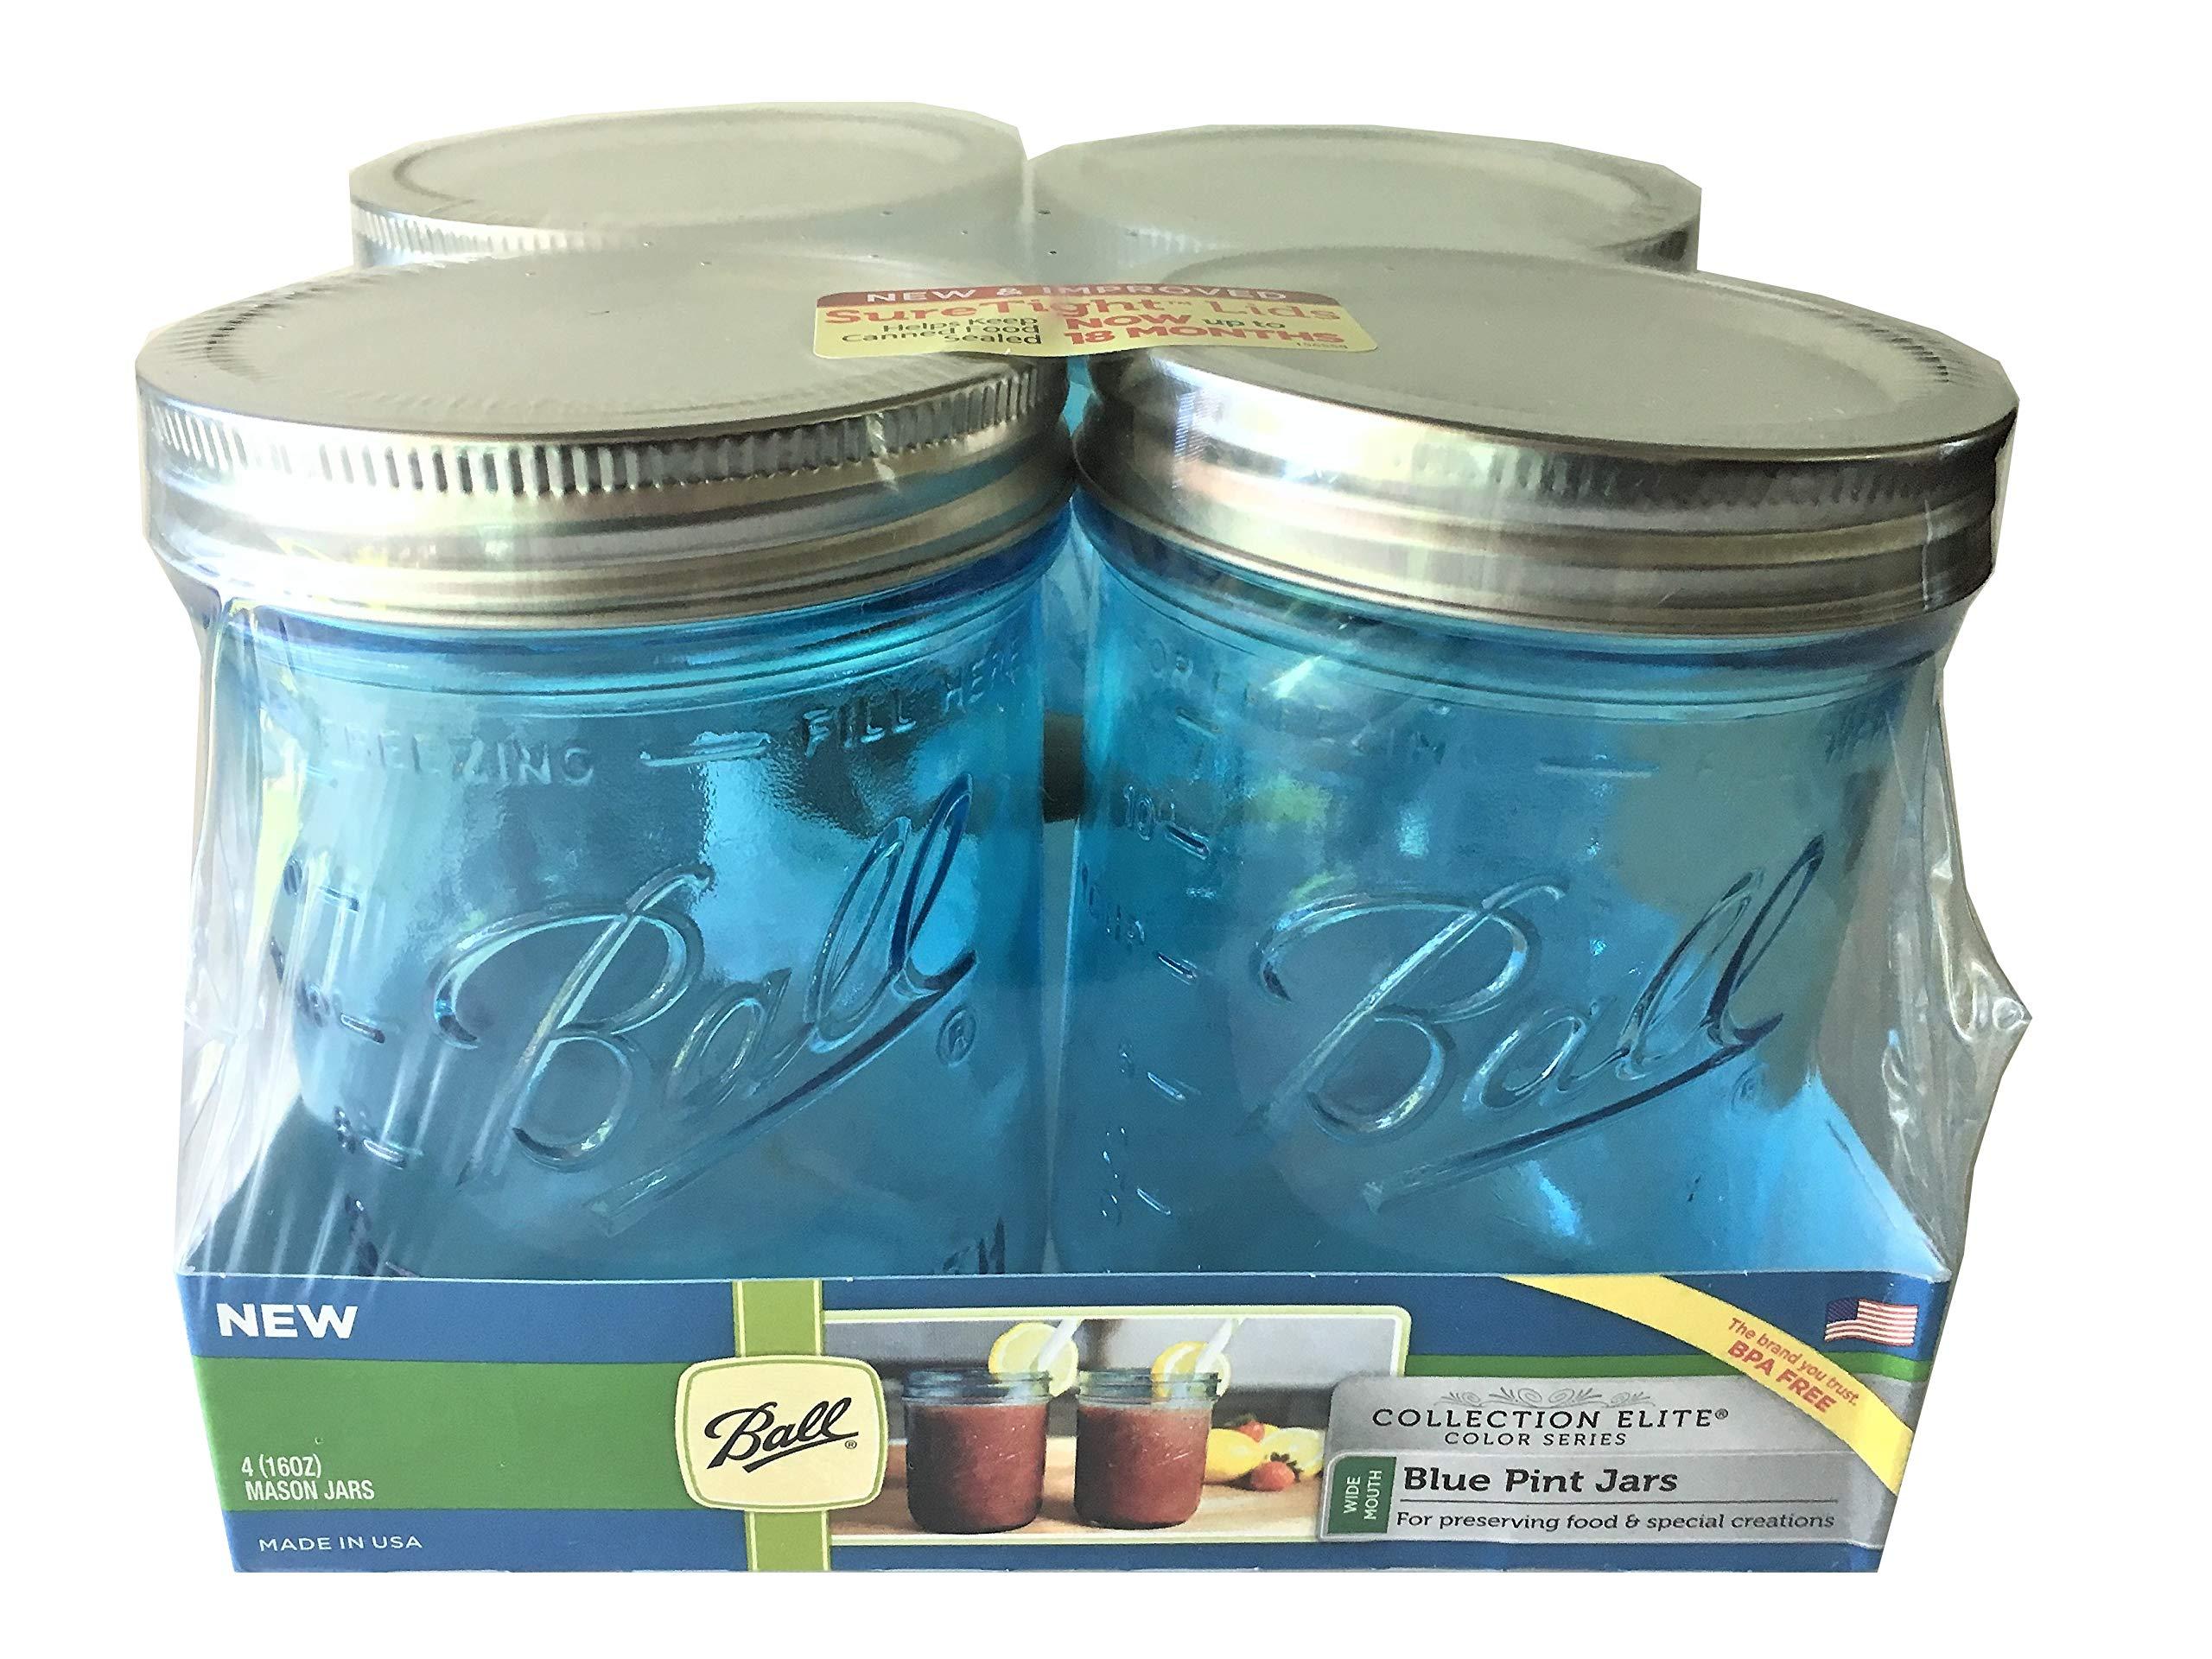 Ball Mason Jar-16 oz. Aqua Blue Glass Wide Mouth - Set of 4